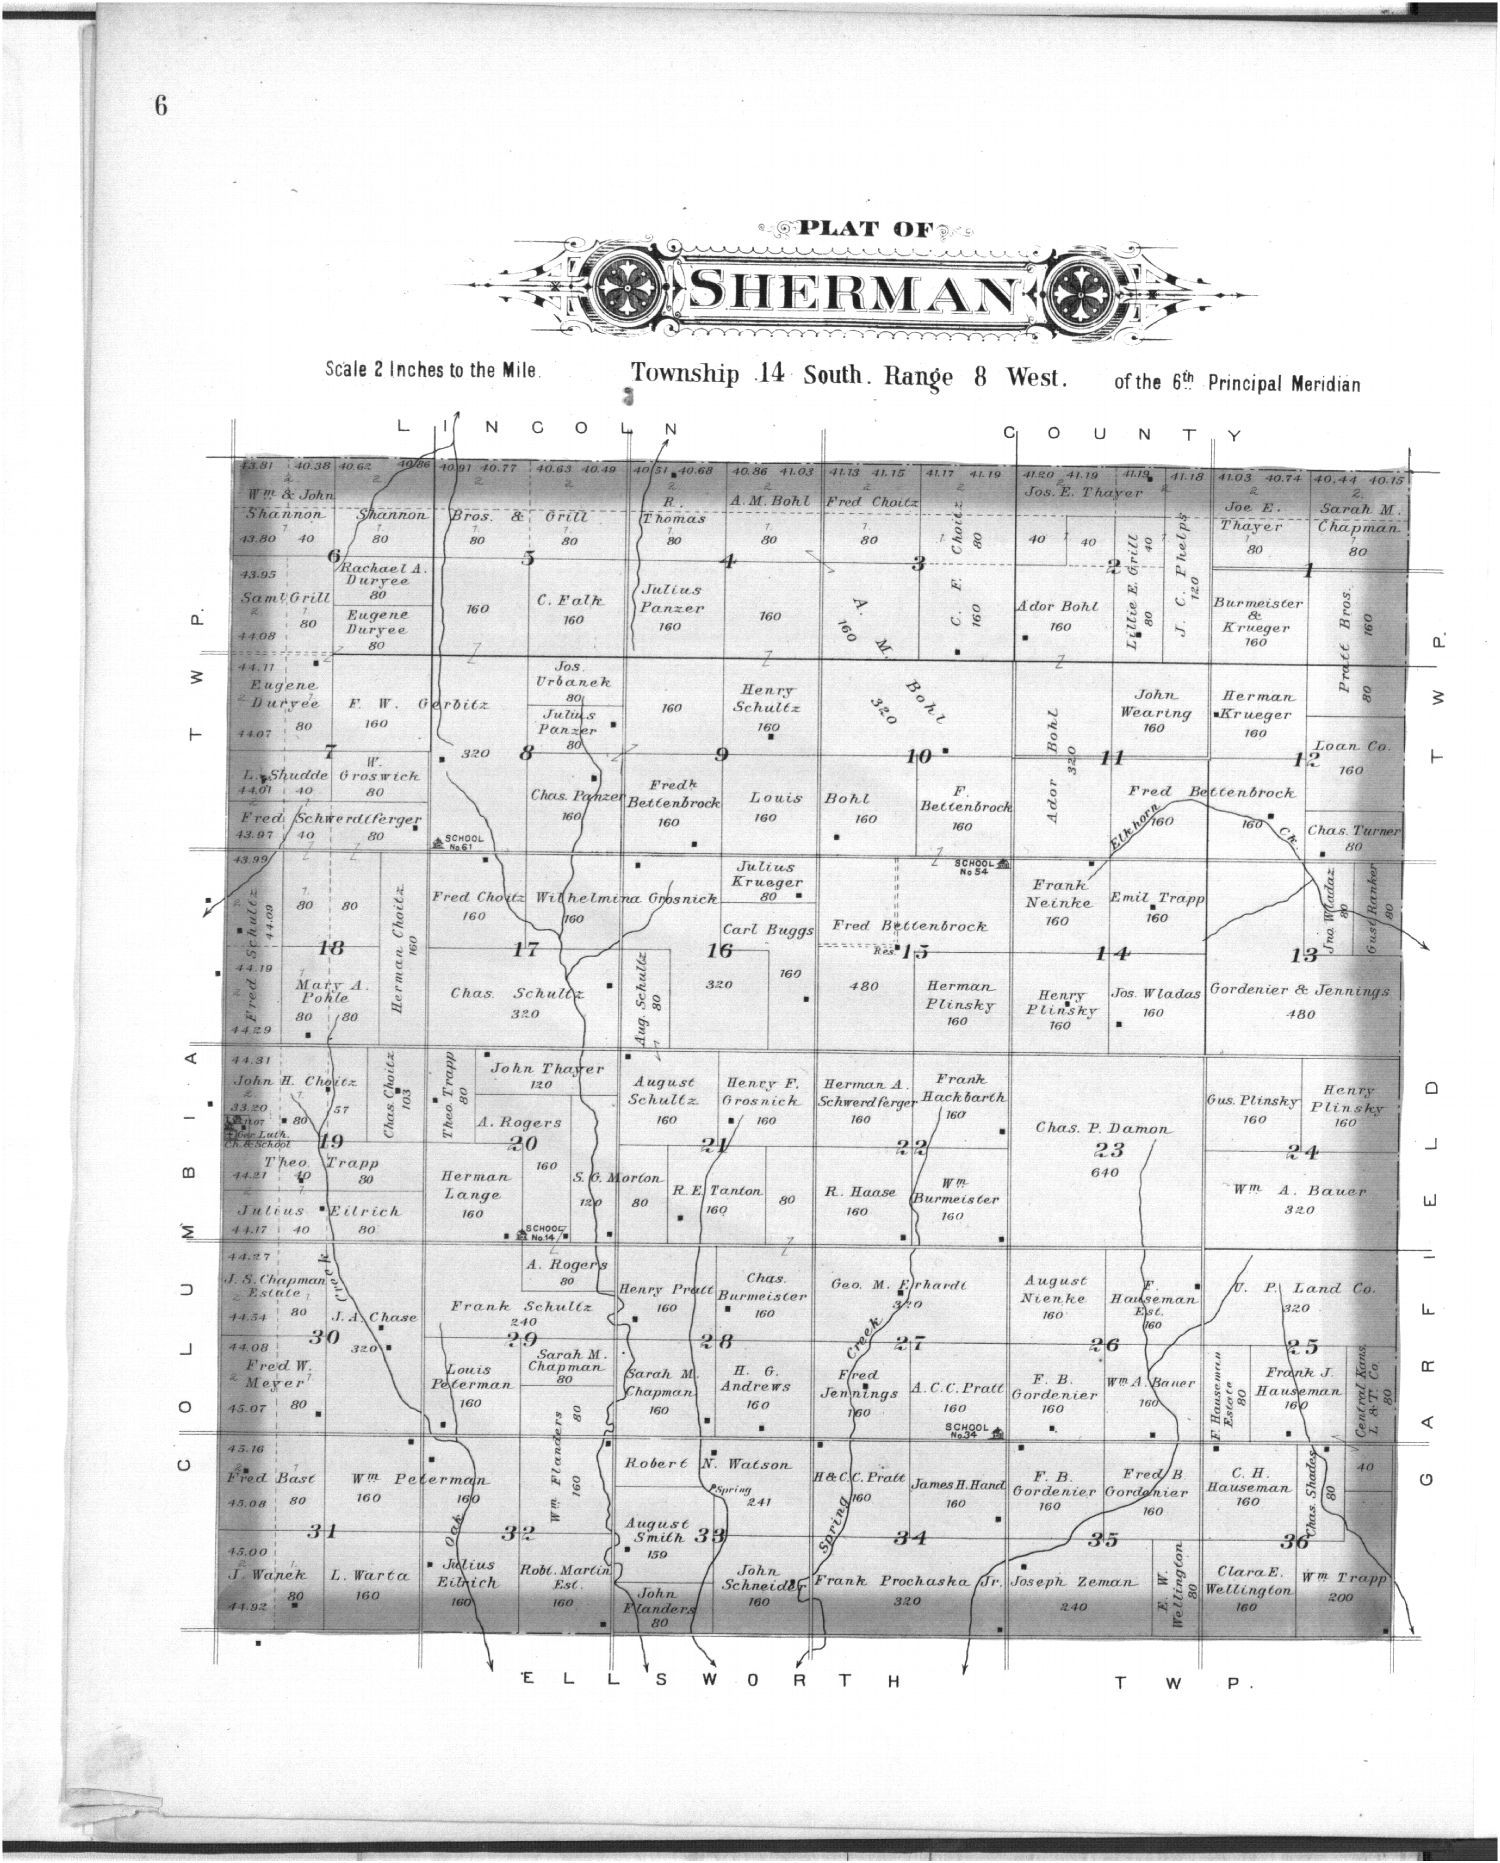 Plat book, Ellsworth County, Kansas - 6